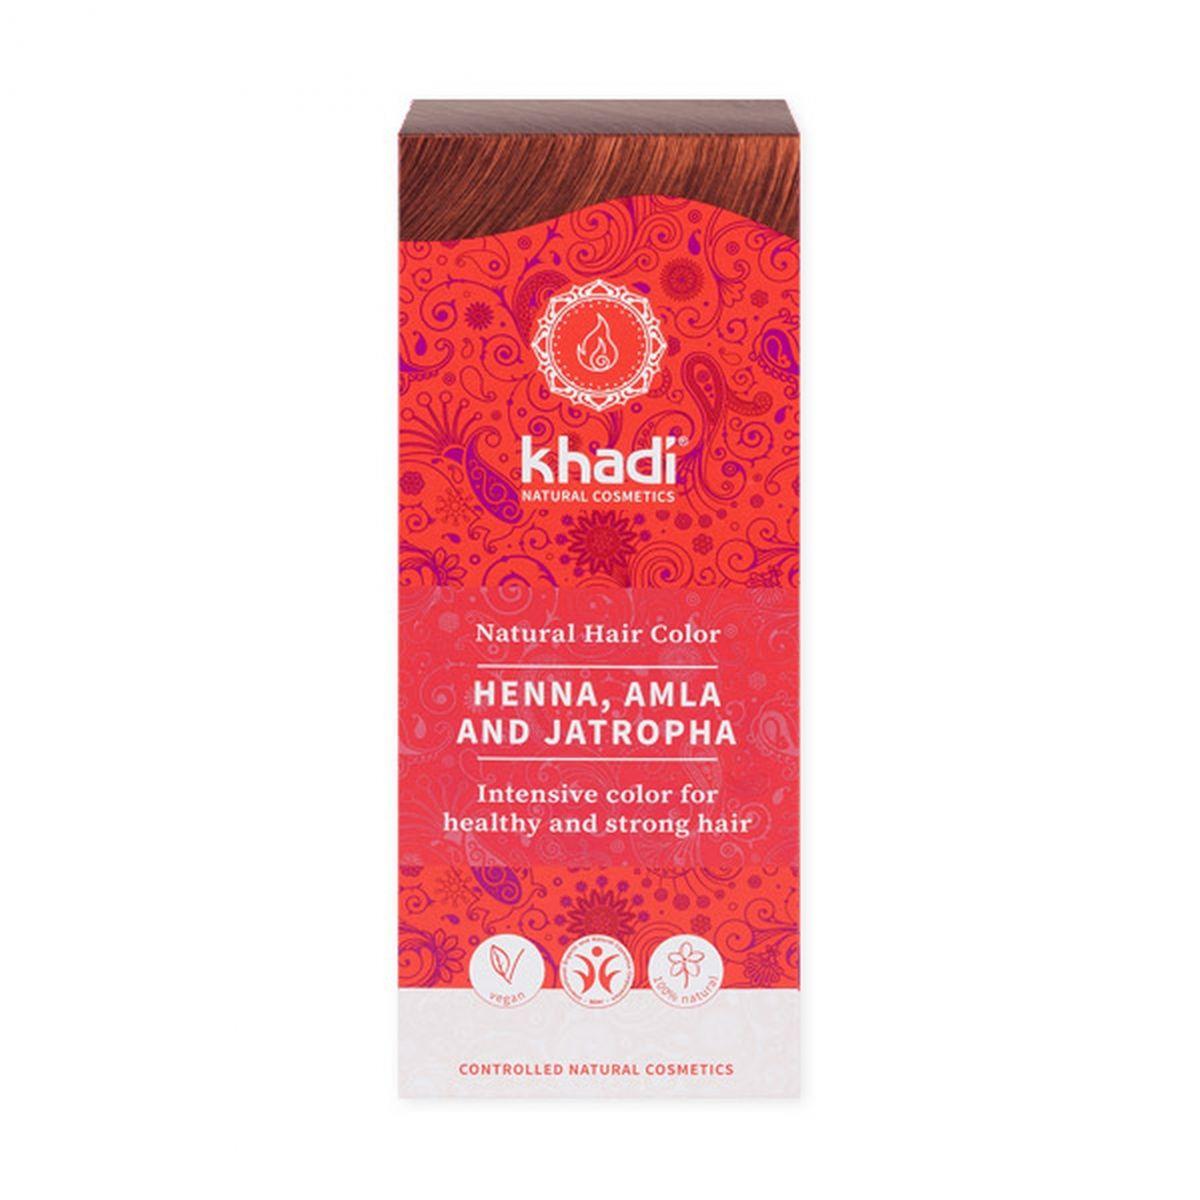 Naturalna indyjska henna - amlą i jatrophą - 100g - Khadi